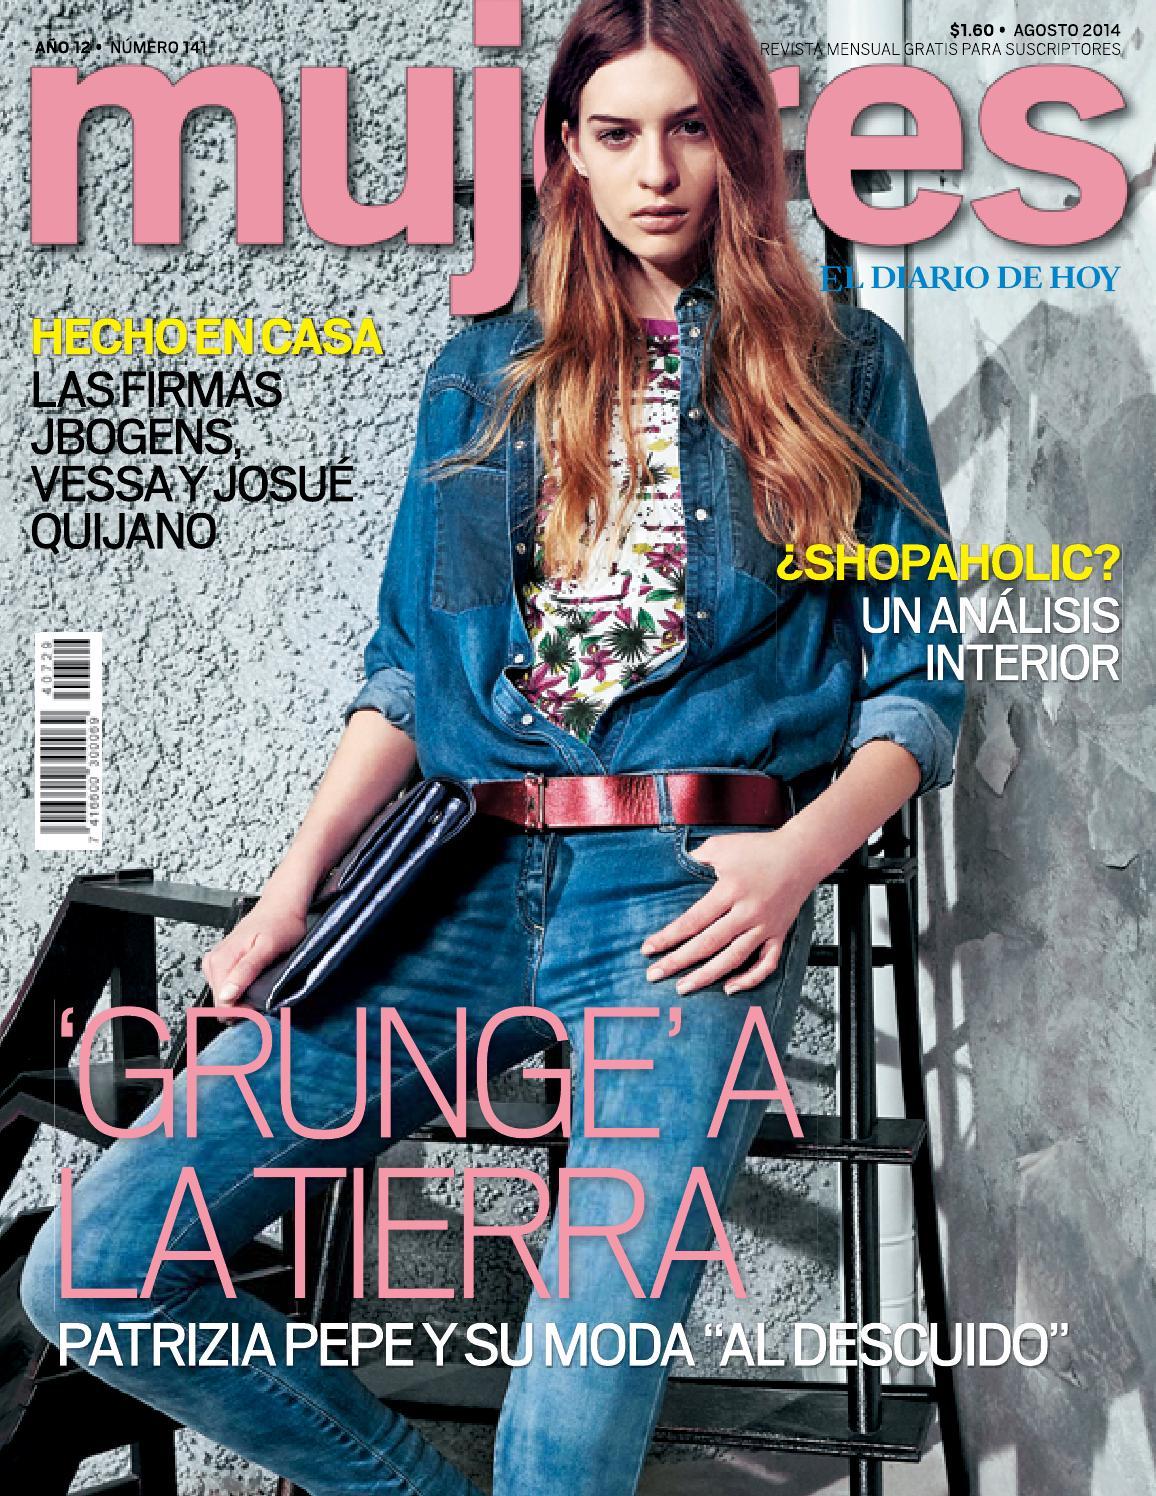 Mujeres agosto 2014 by grupo editorial altamirano issuu